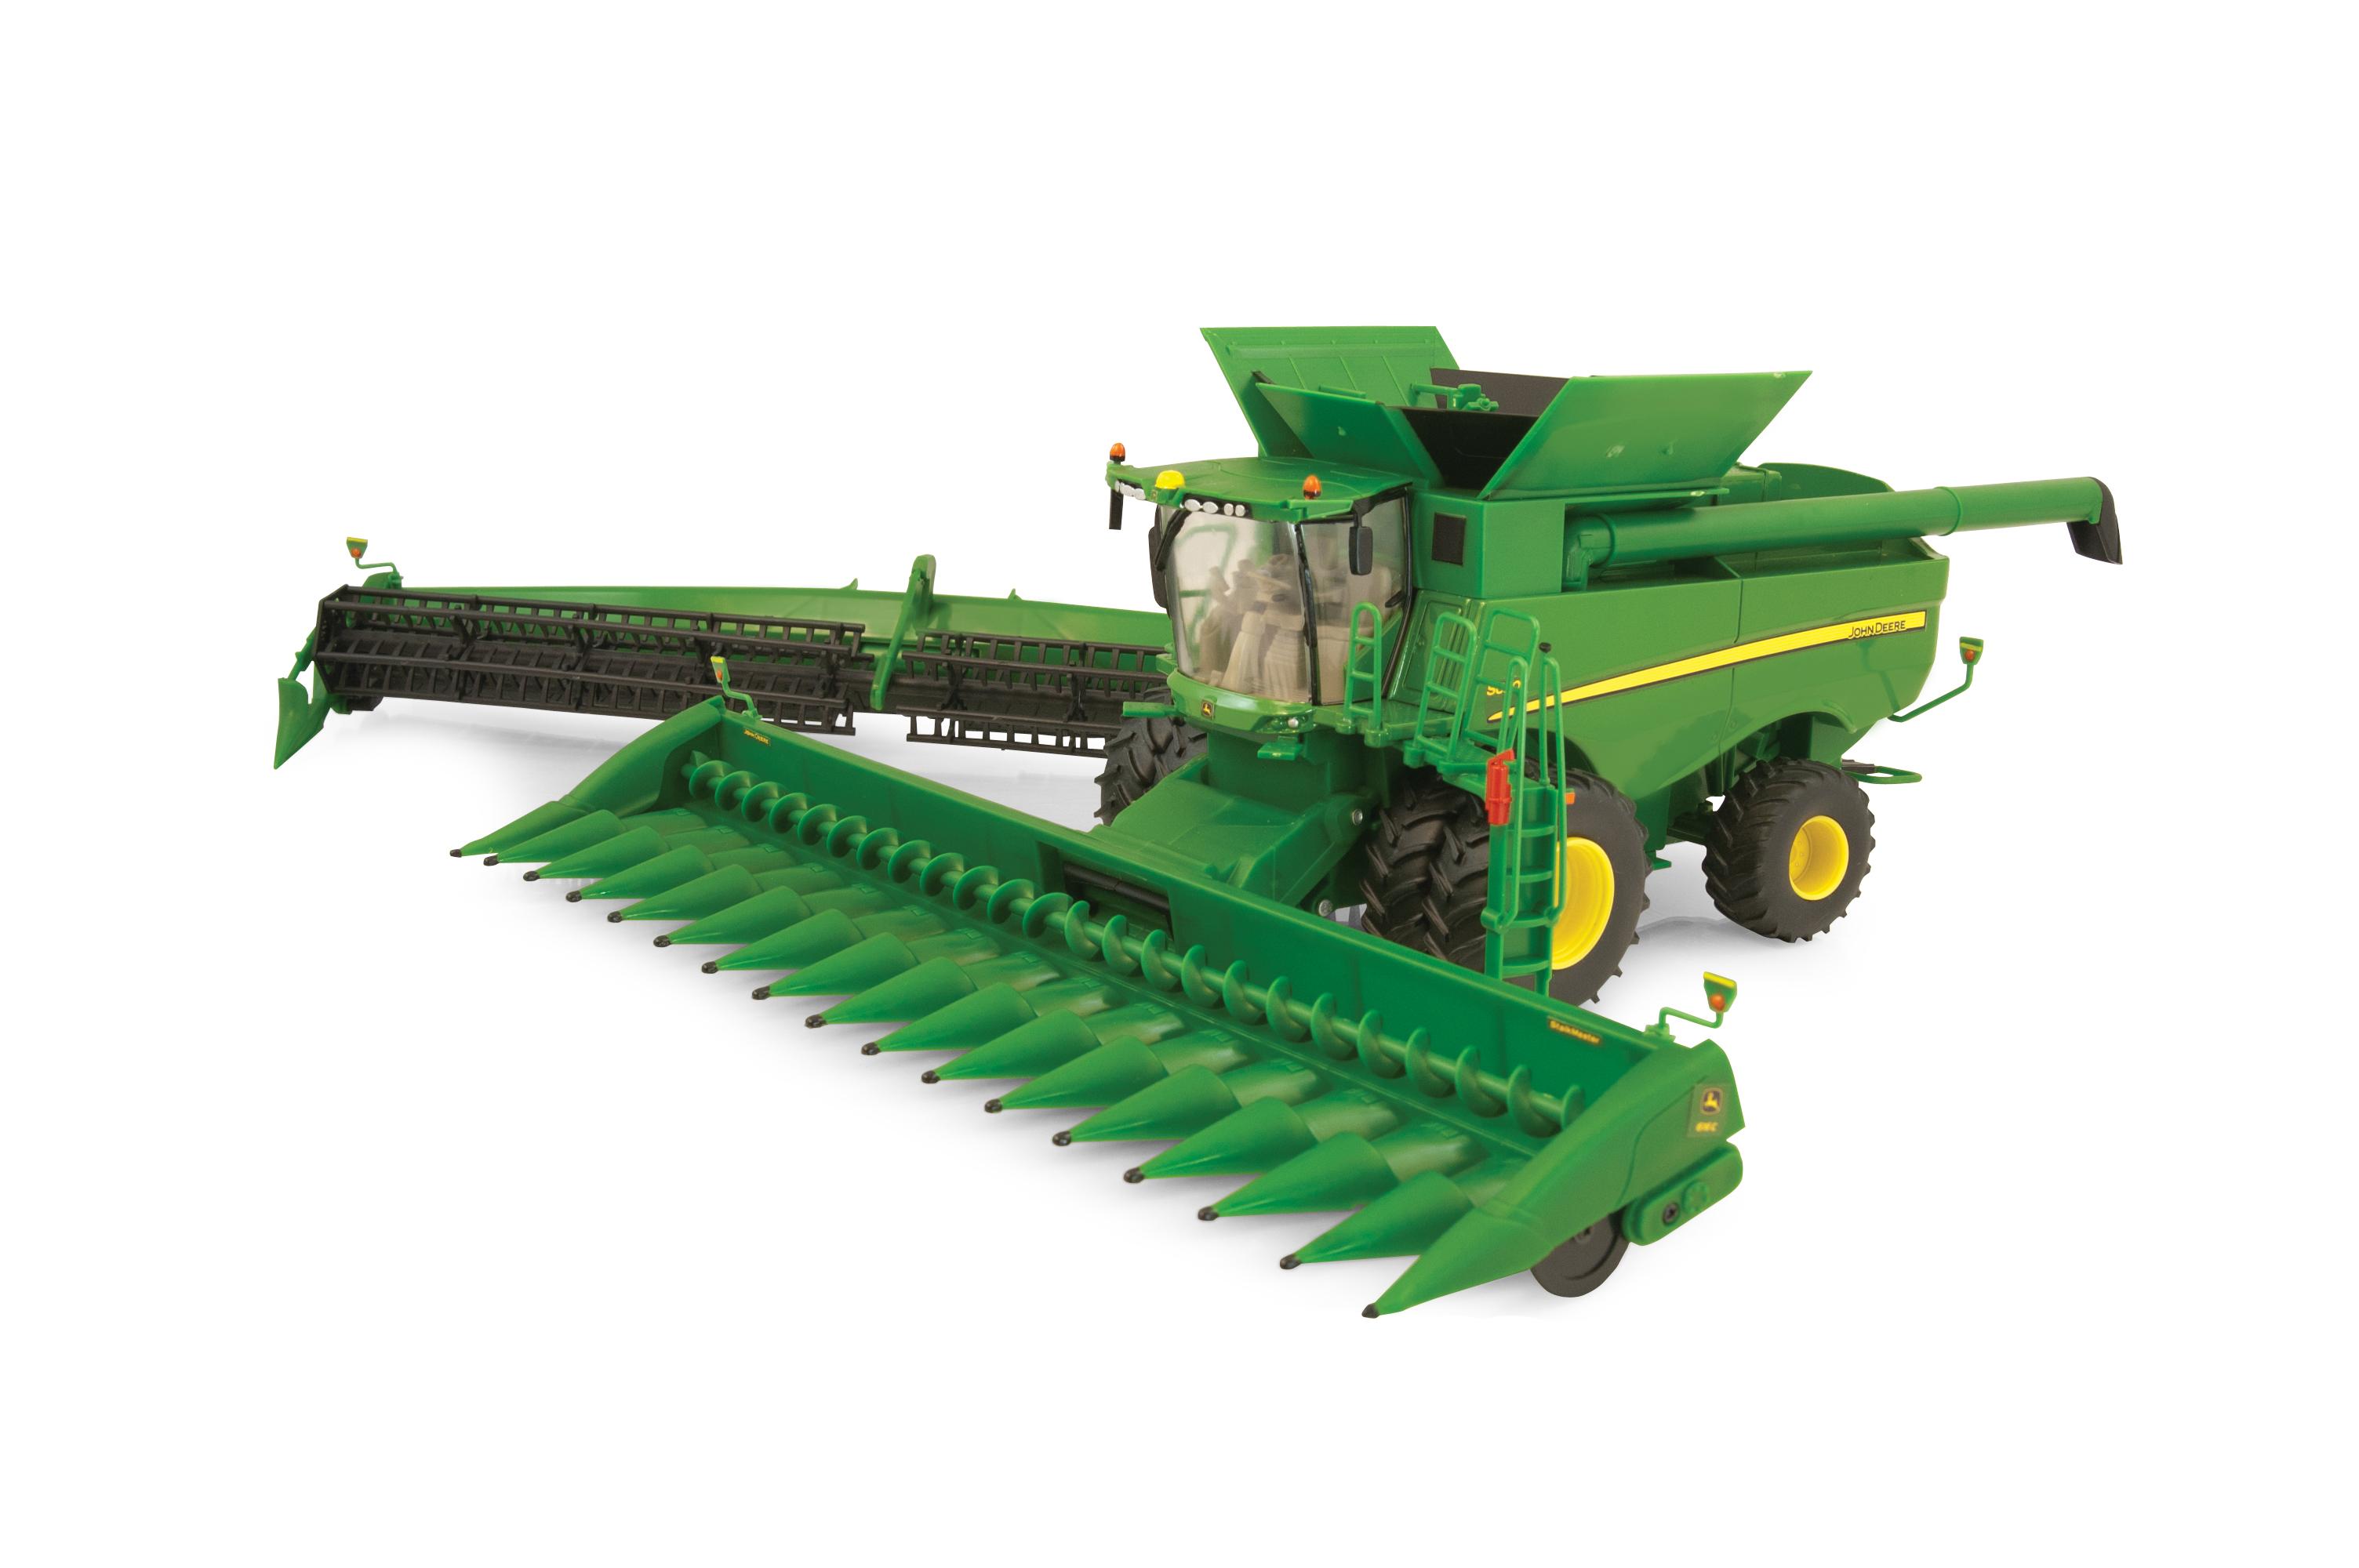 John Deere Combine >> John Deere S690 Combine Down On The Farm